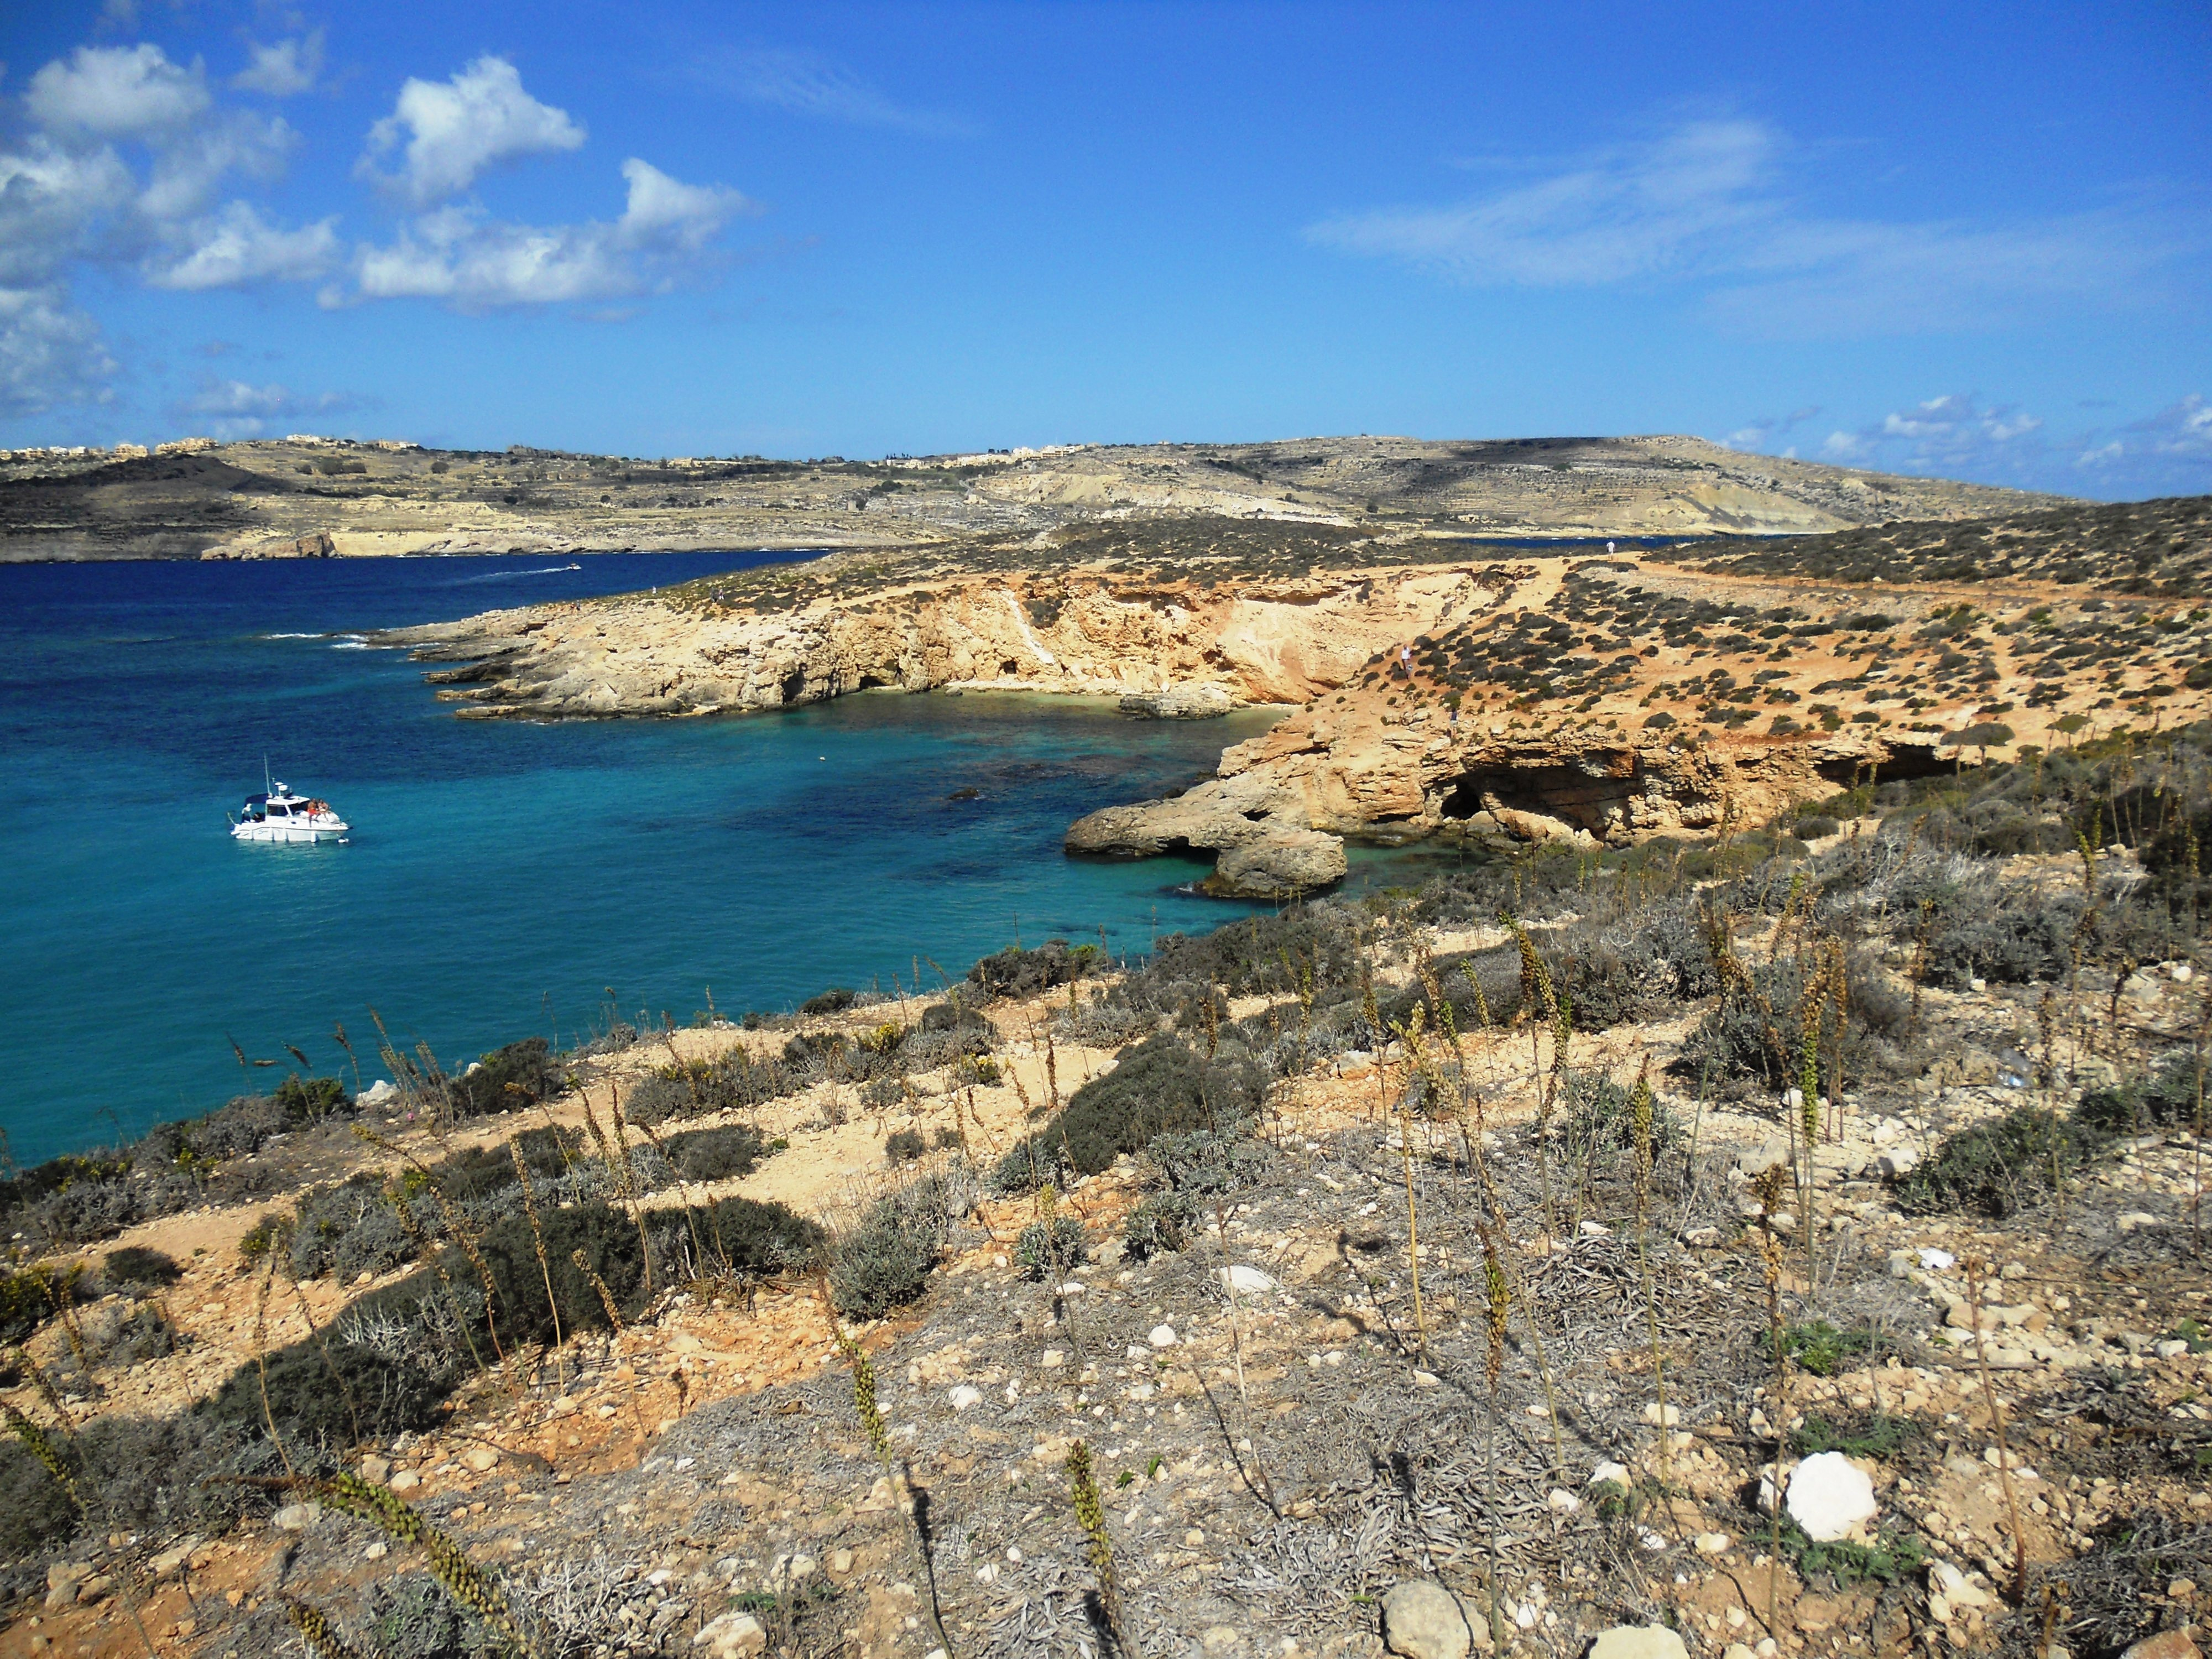 Malte Comino 2 Quelques photos de ma retraite au soleil à Malte